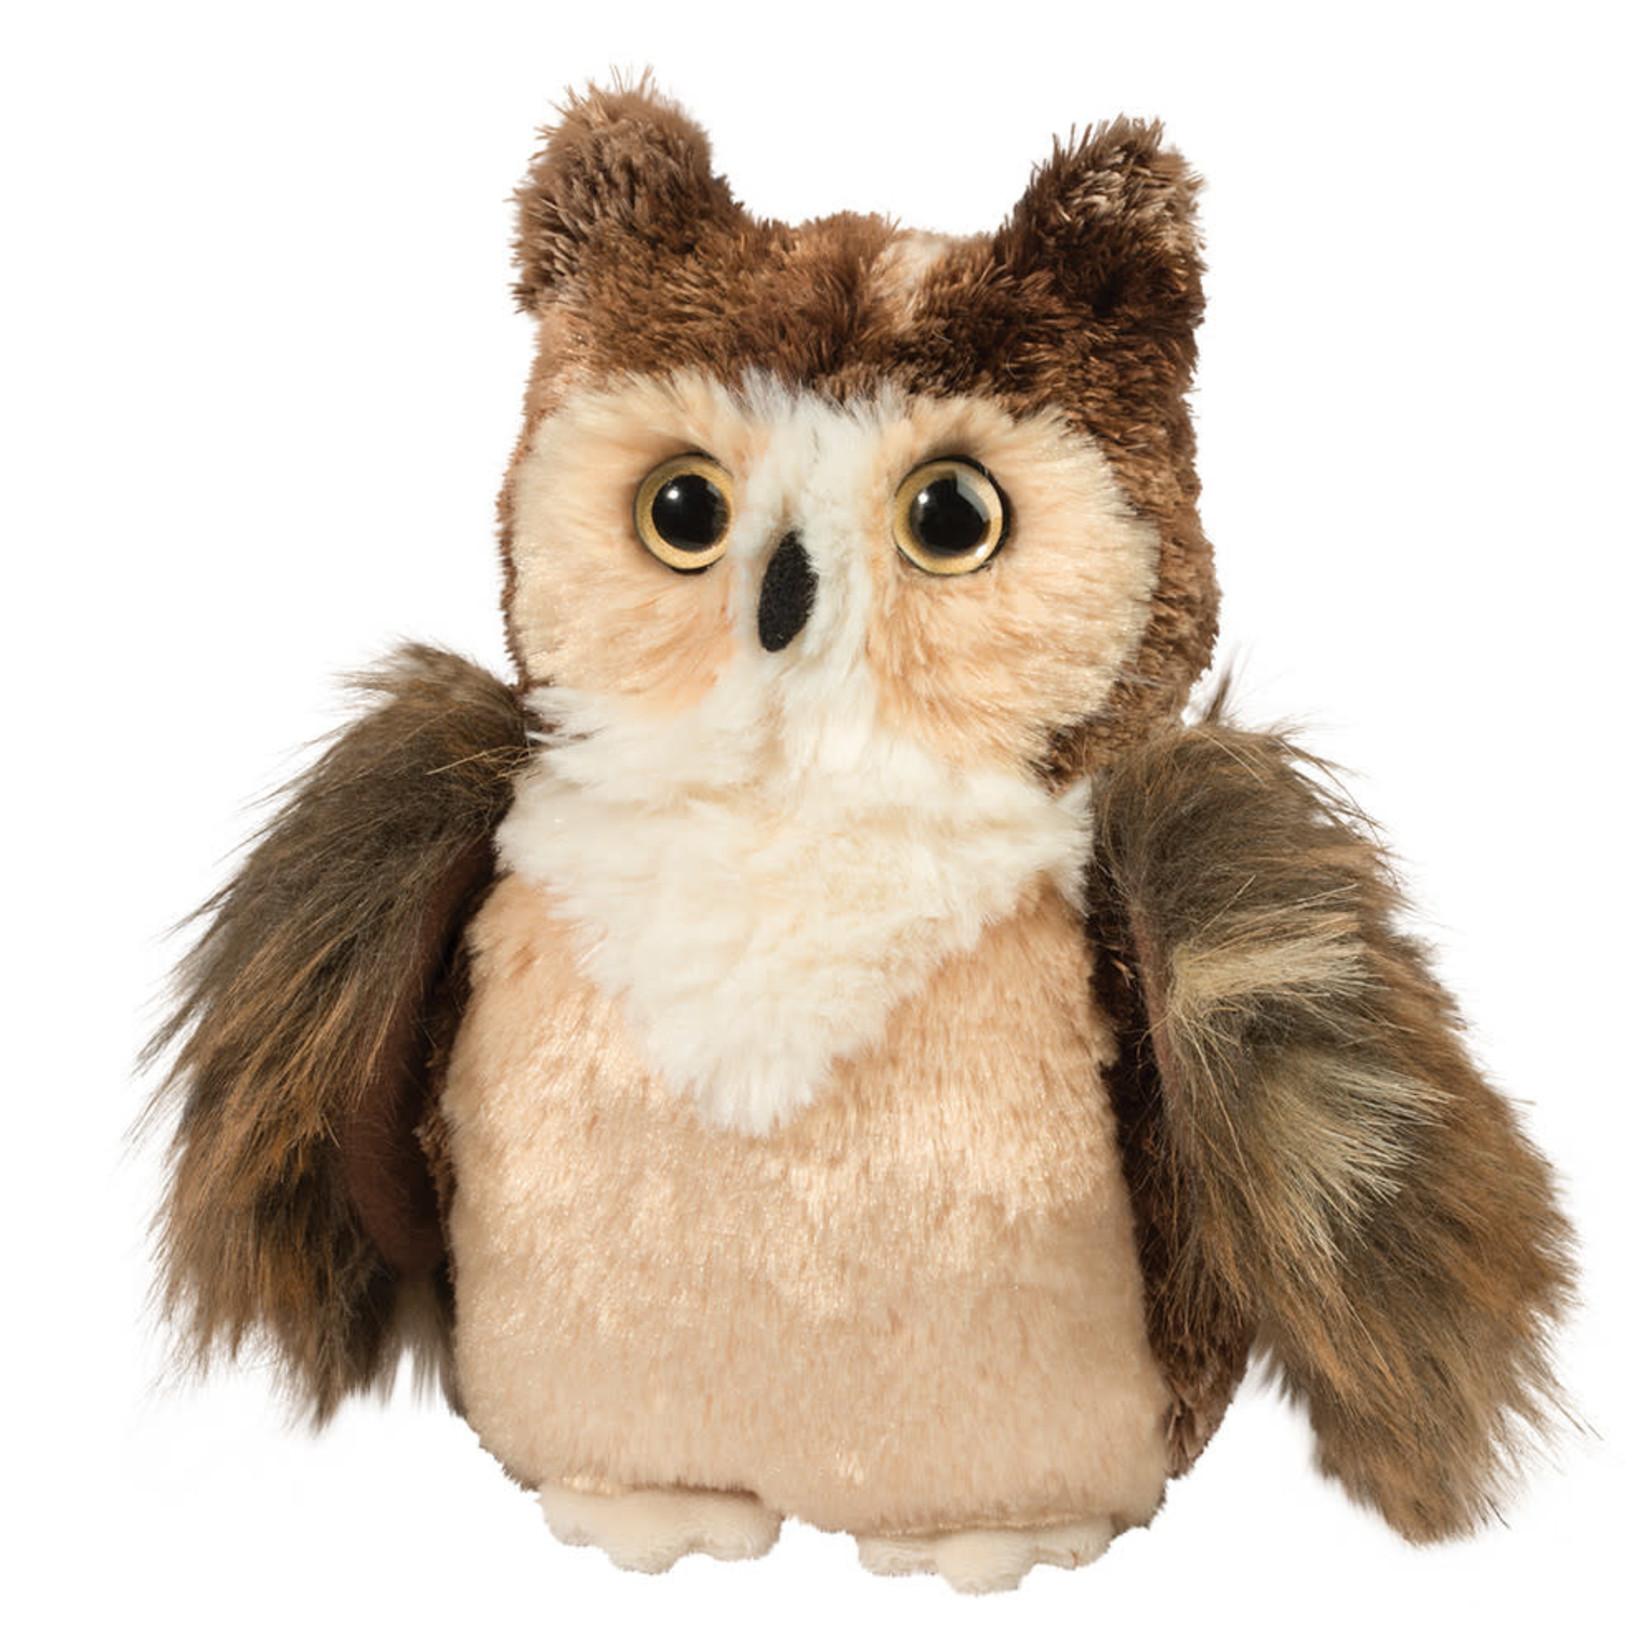 Douglas Rucker Owl - Small